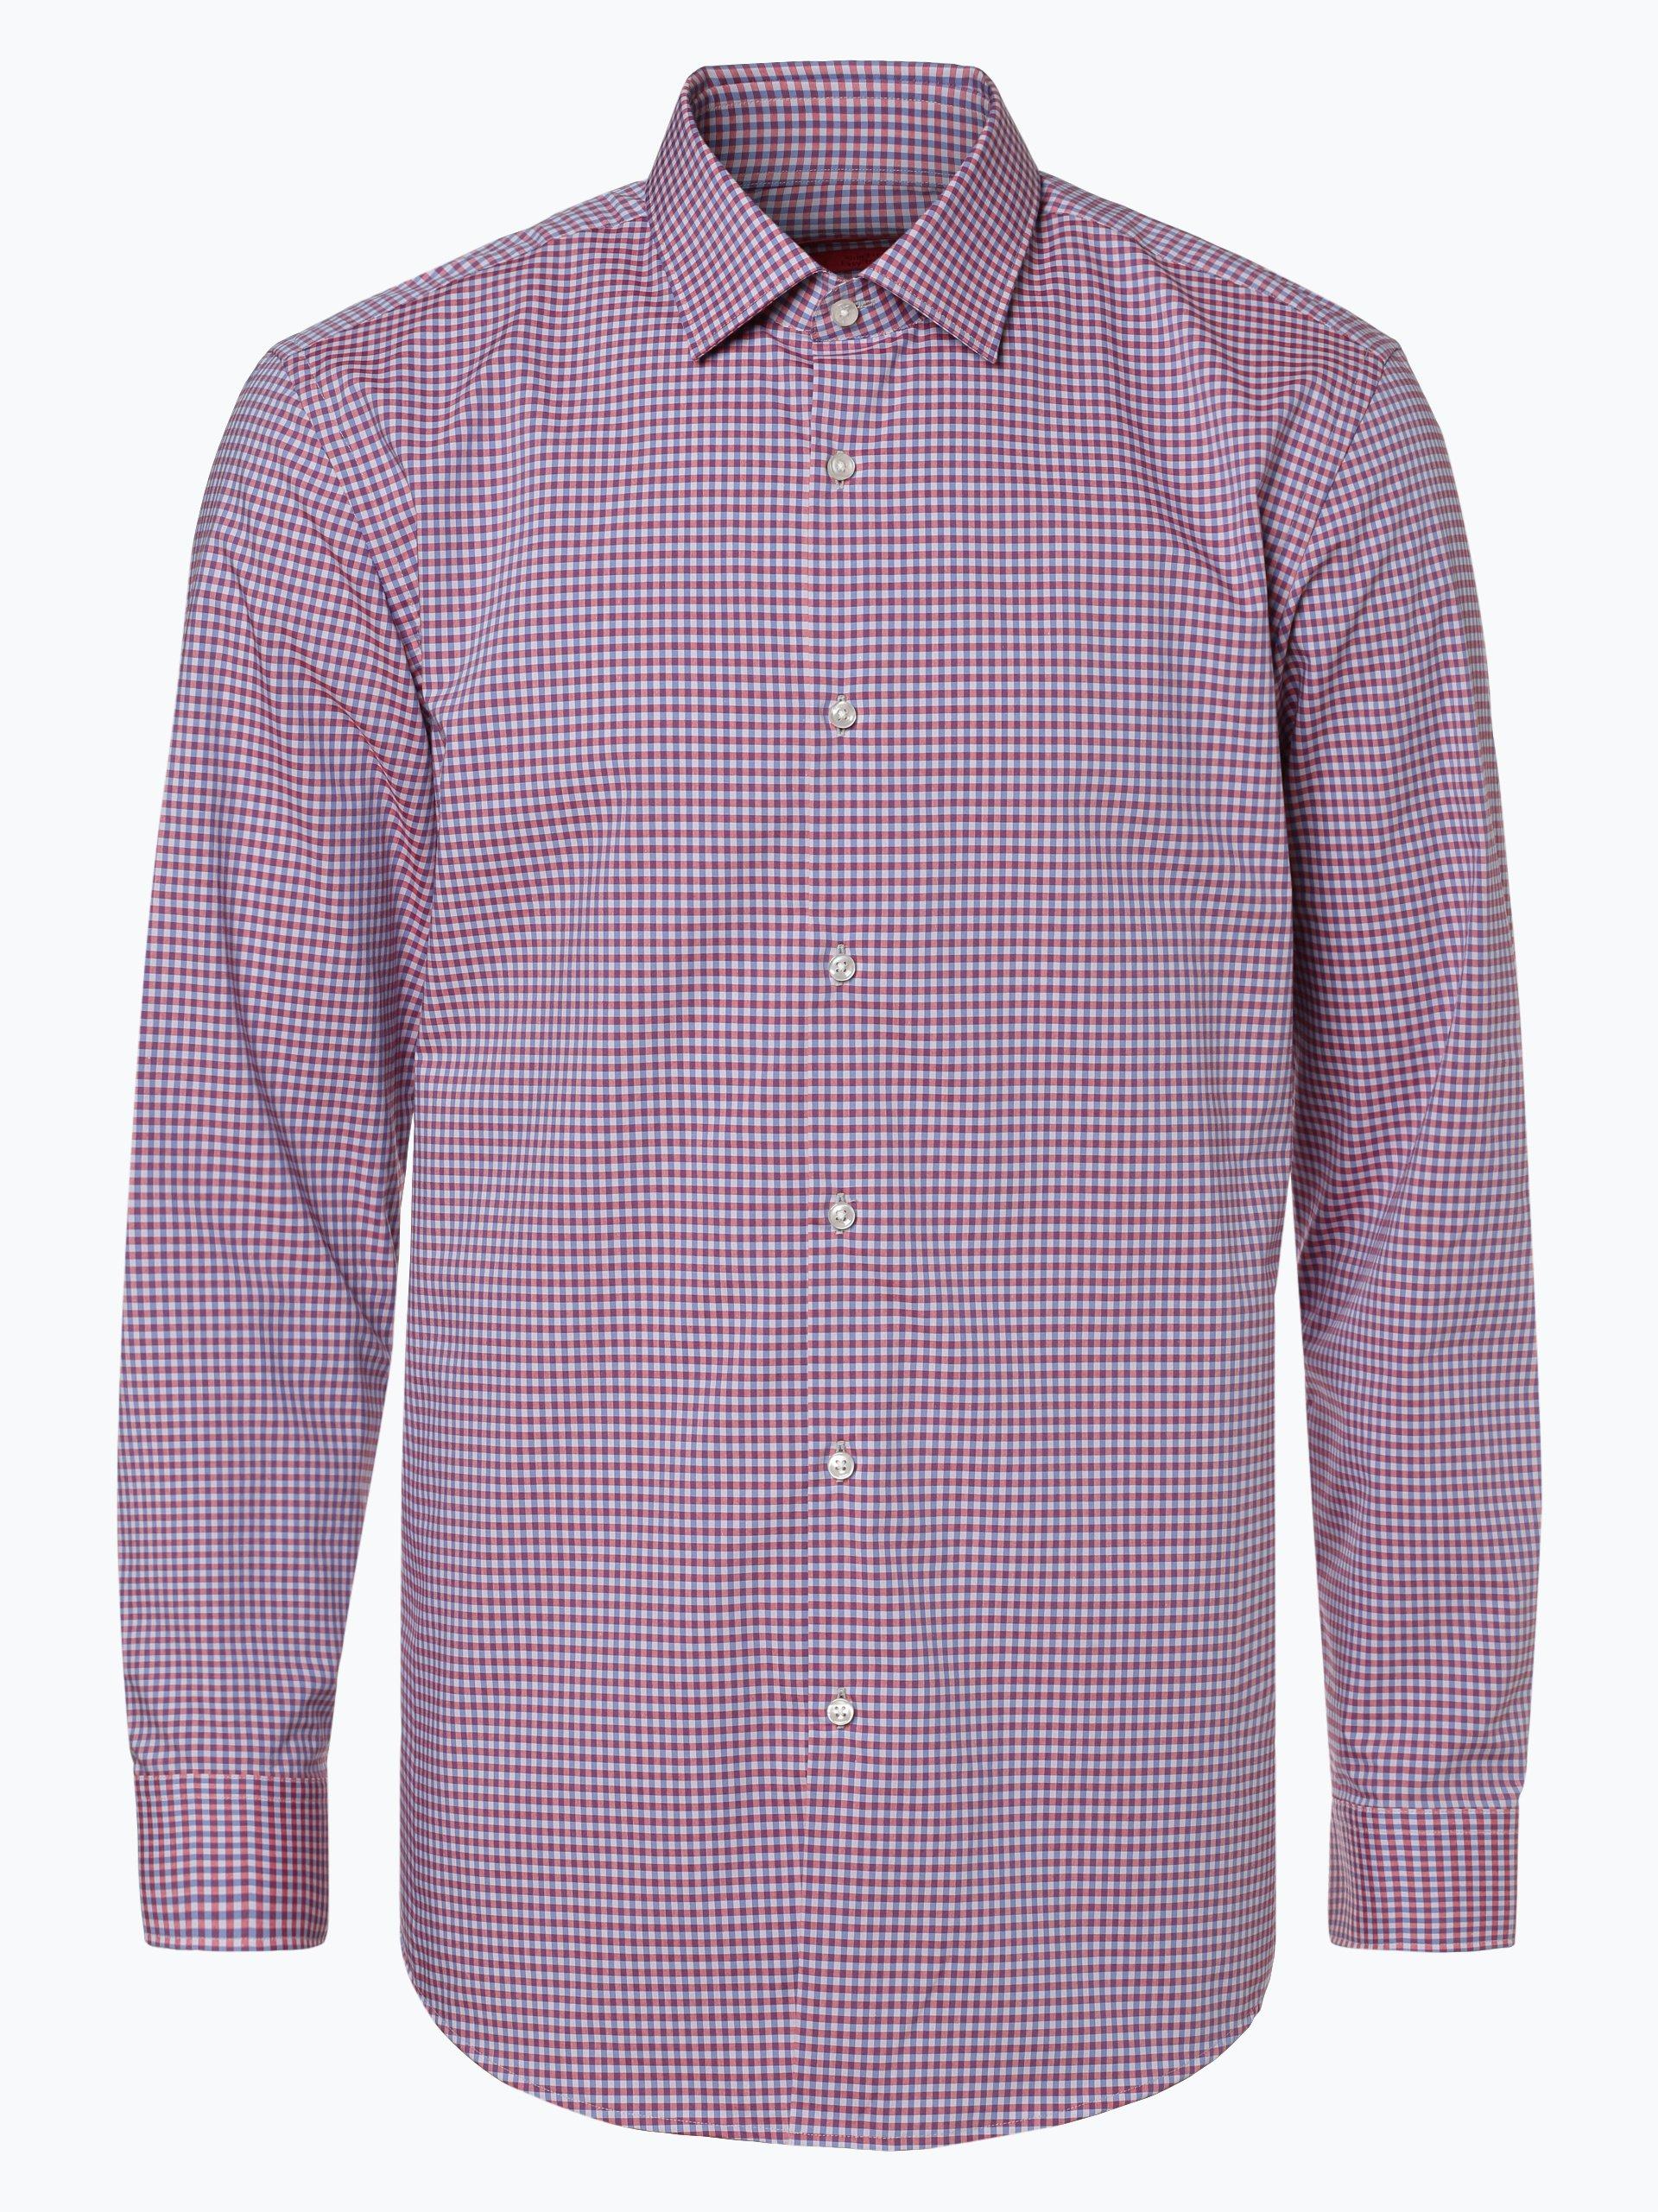 HUGO Herren Hemd Bügelleicht - Kenn